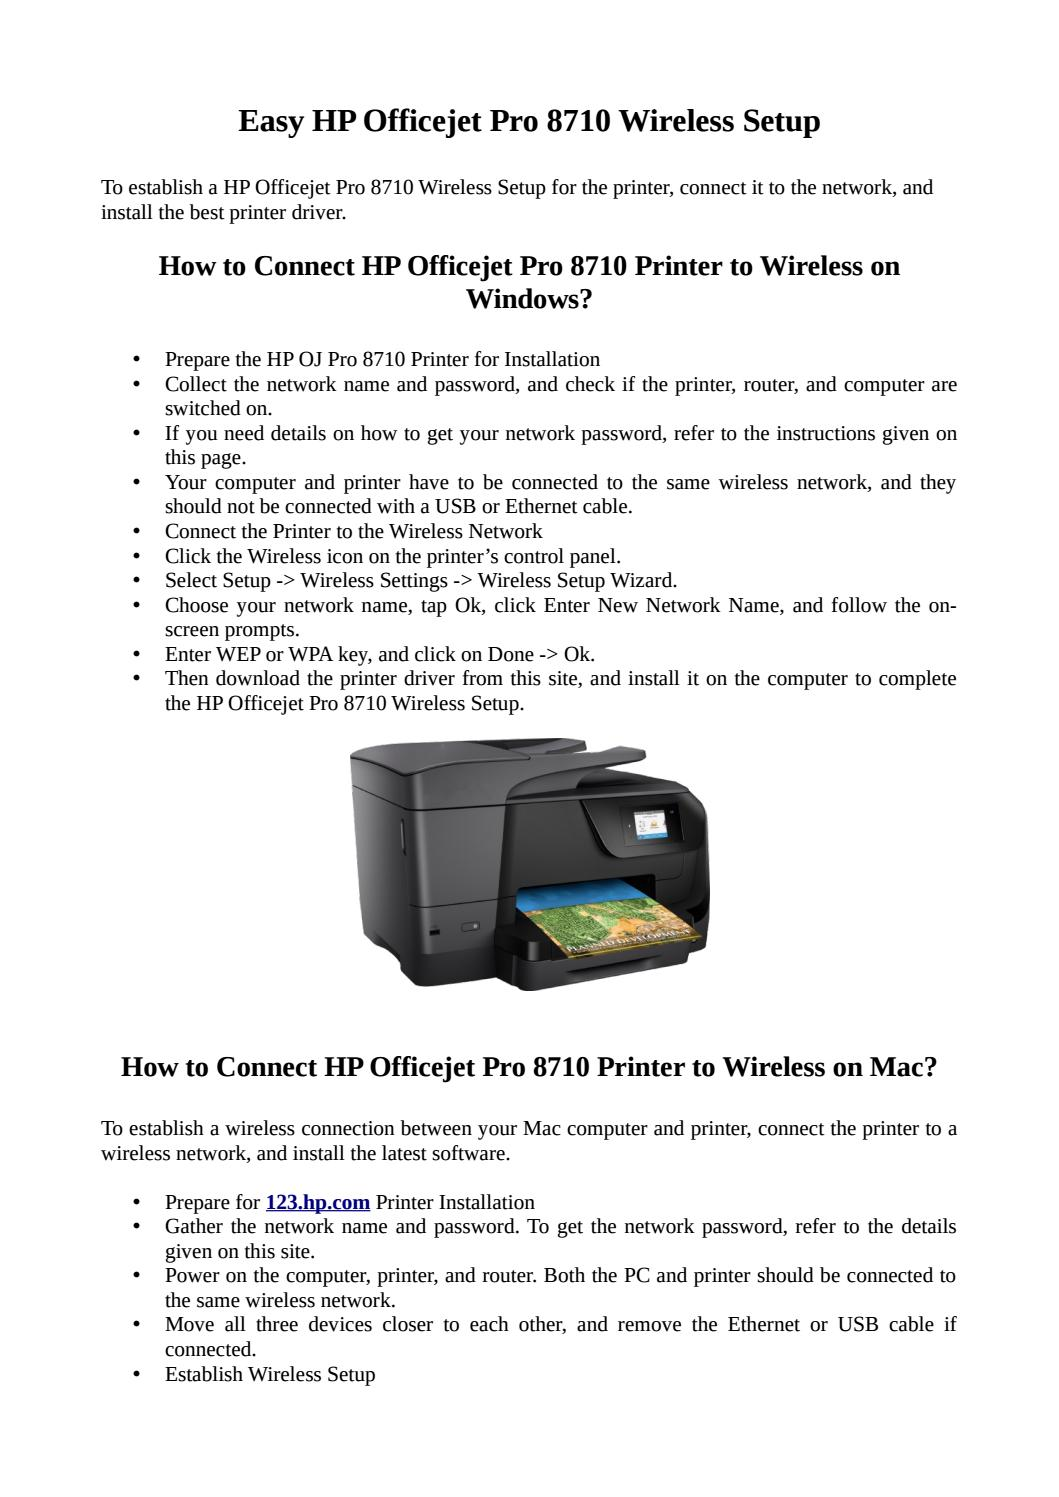 Procedure for HP Officejet Pro 8710 Wireless Setup by